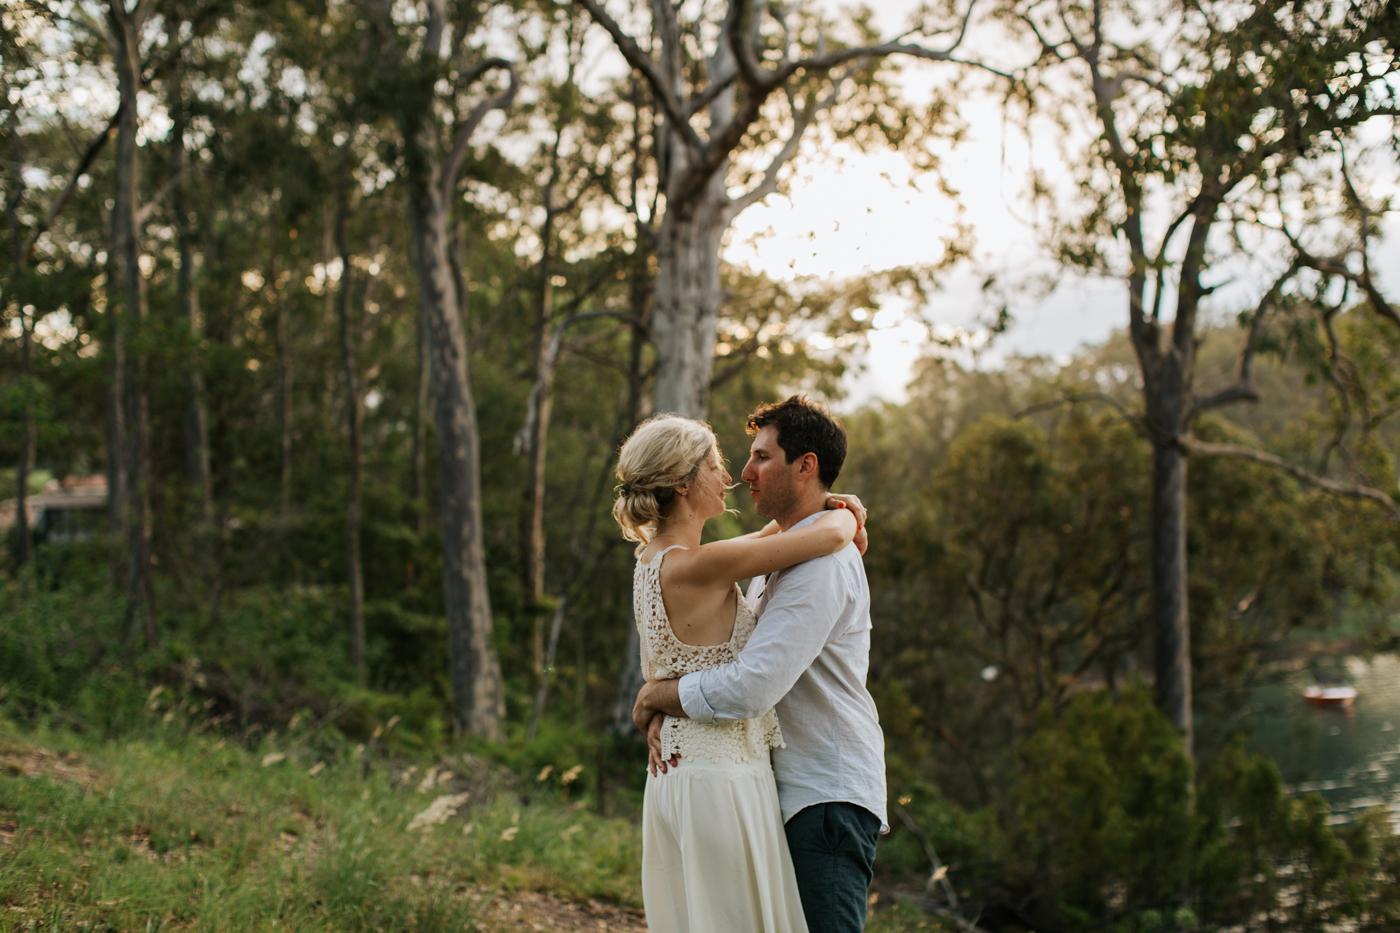 Emma & Ben - Lake Macquarie - Hunter Valley Wedding - Samantha Heather Photography-218.jpg